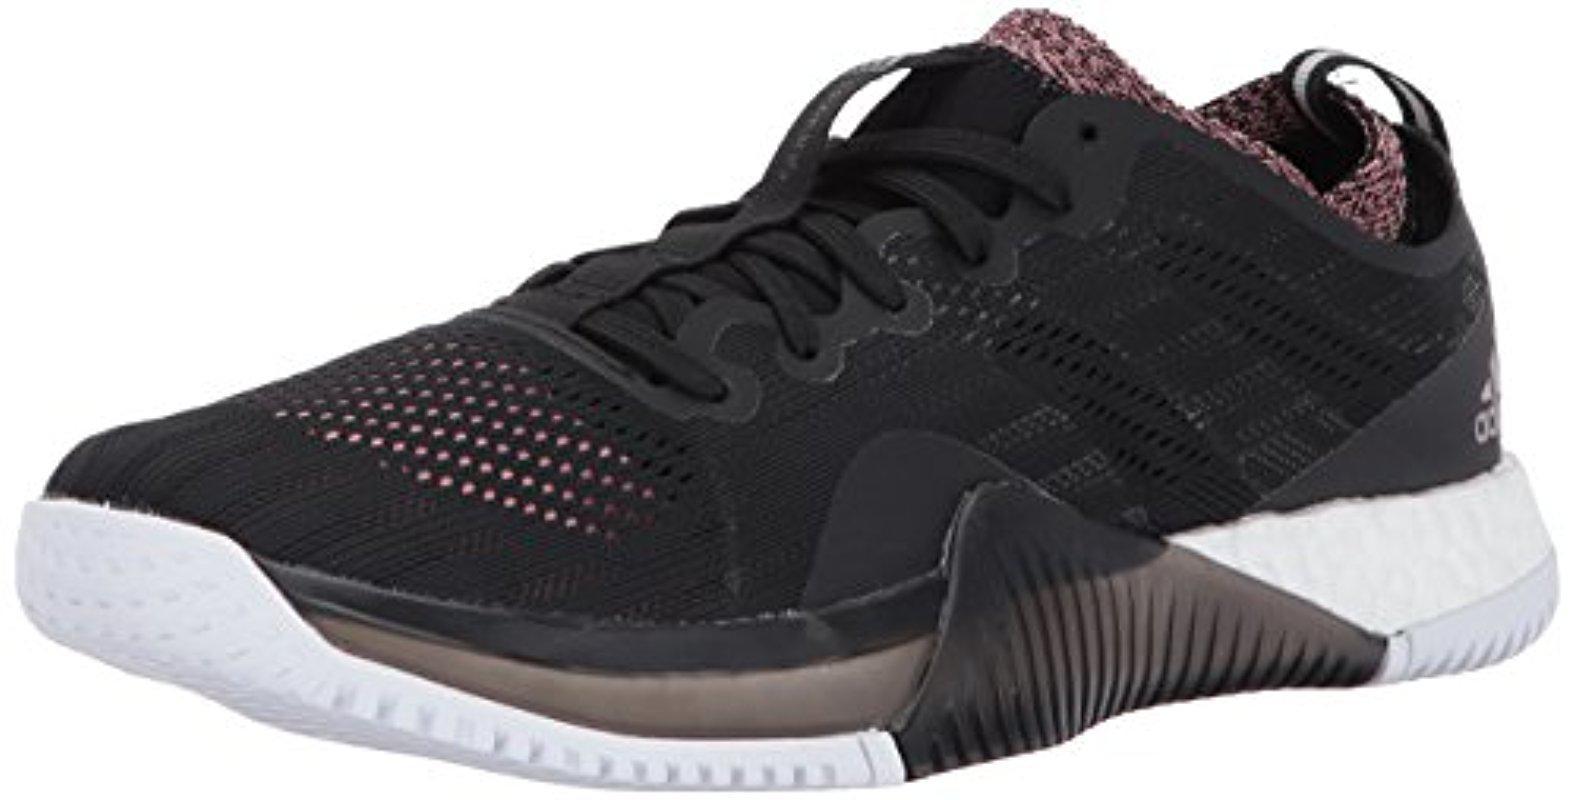 01431a478c333 Lyst - adidas Crazytrain Elite W Cross Trainer in Black - Save 9%